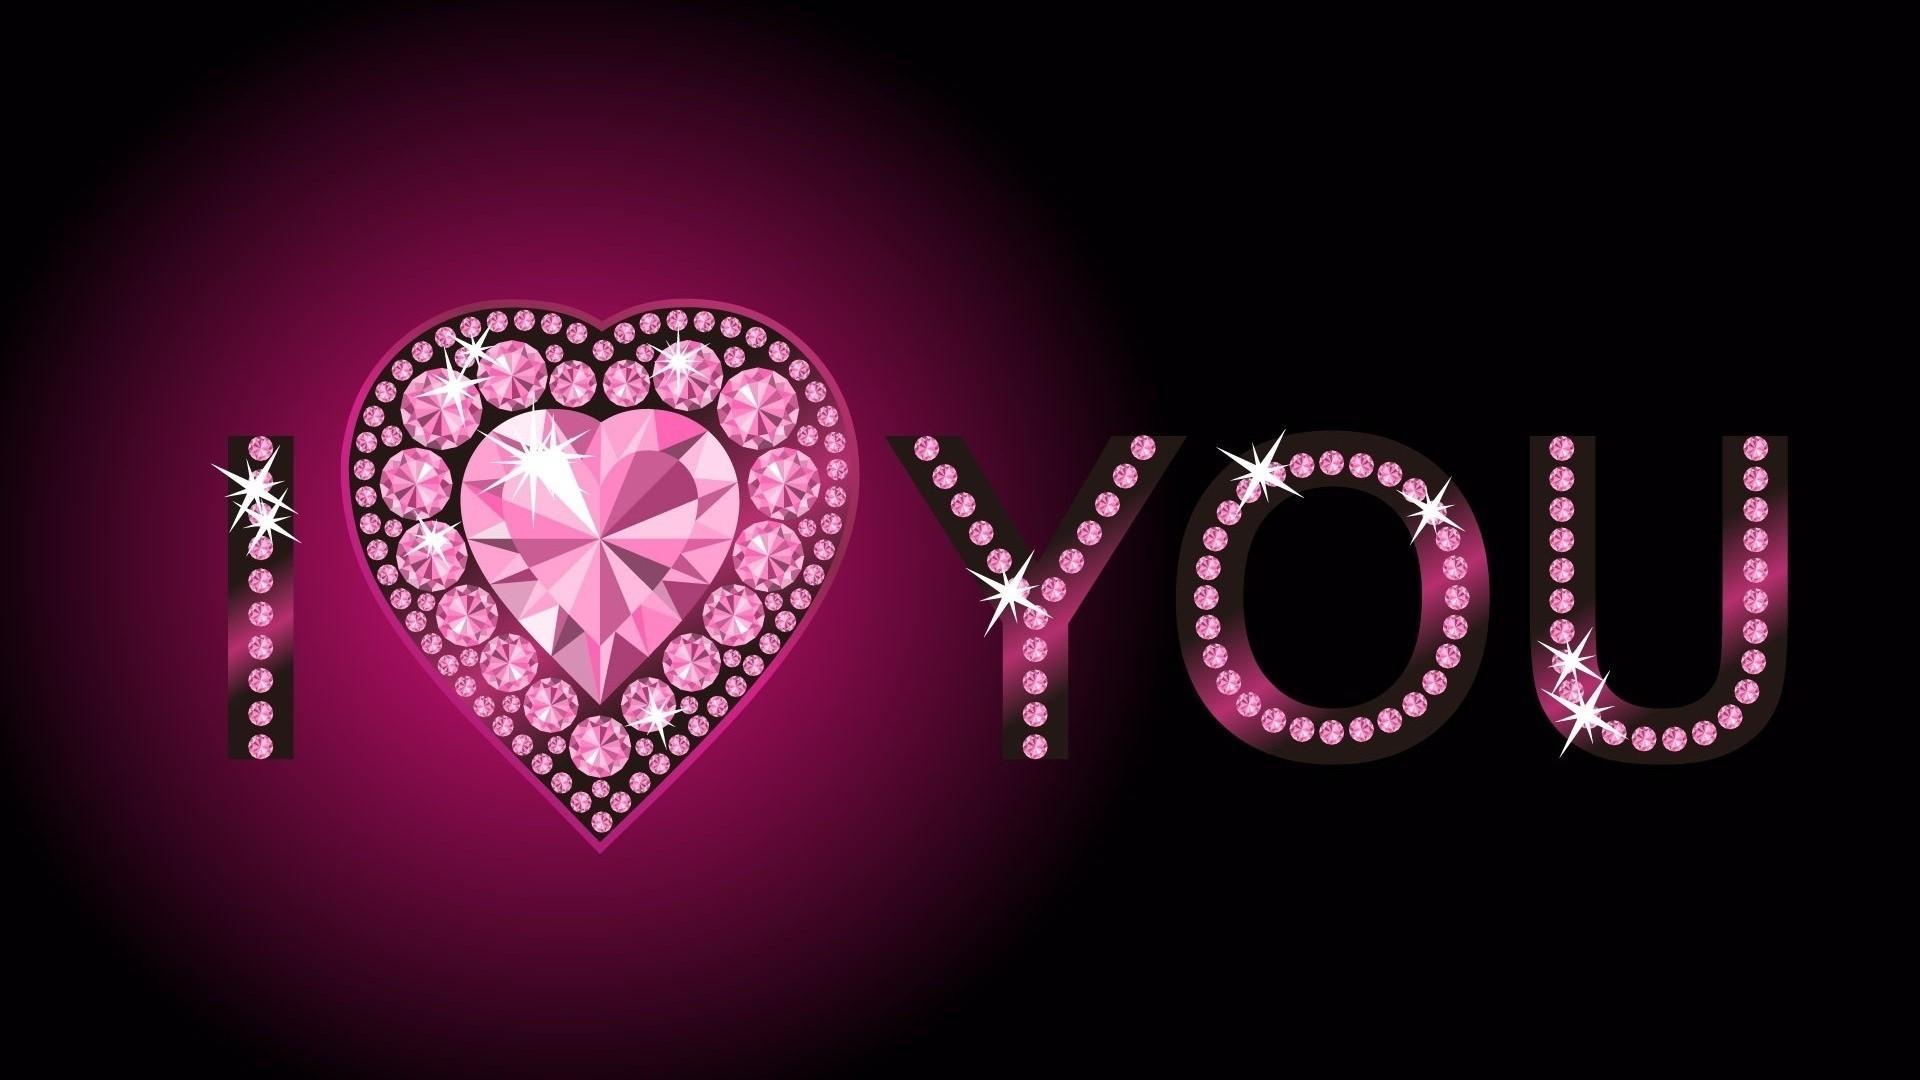 Res: 1920x1080,  Cute Love Heart wallpaper HD Free Pink Heart Wallpapers  1920×1200 Wallpapers Of Love